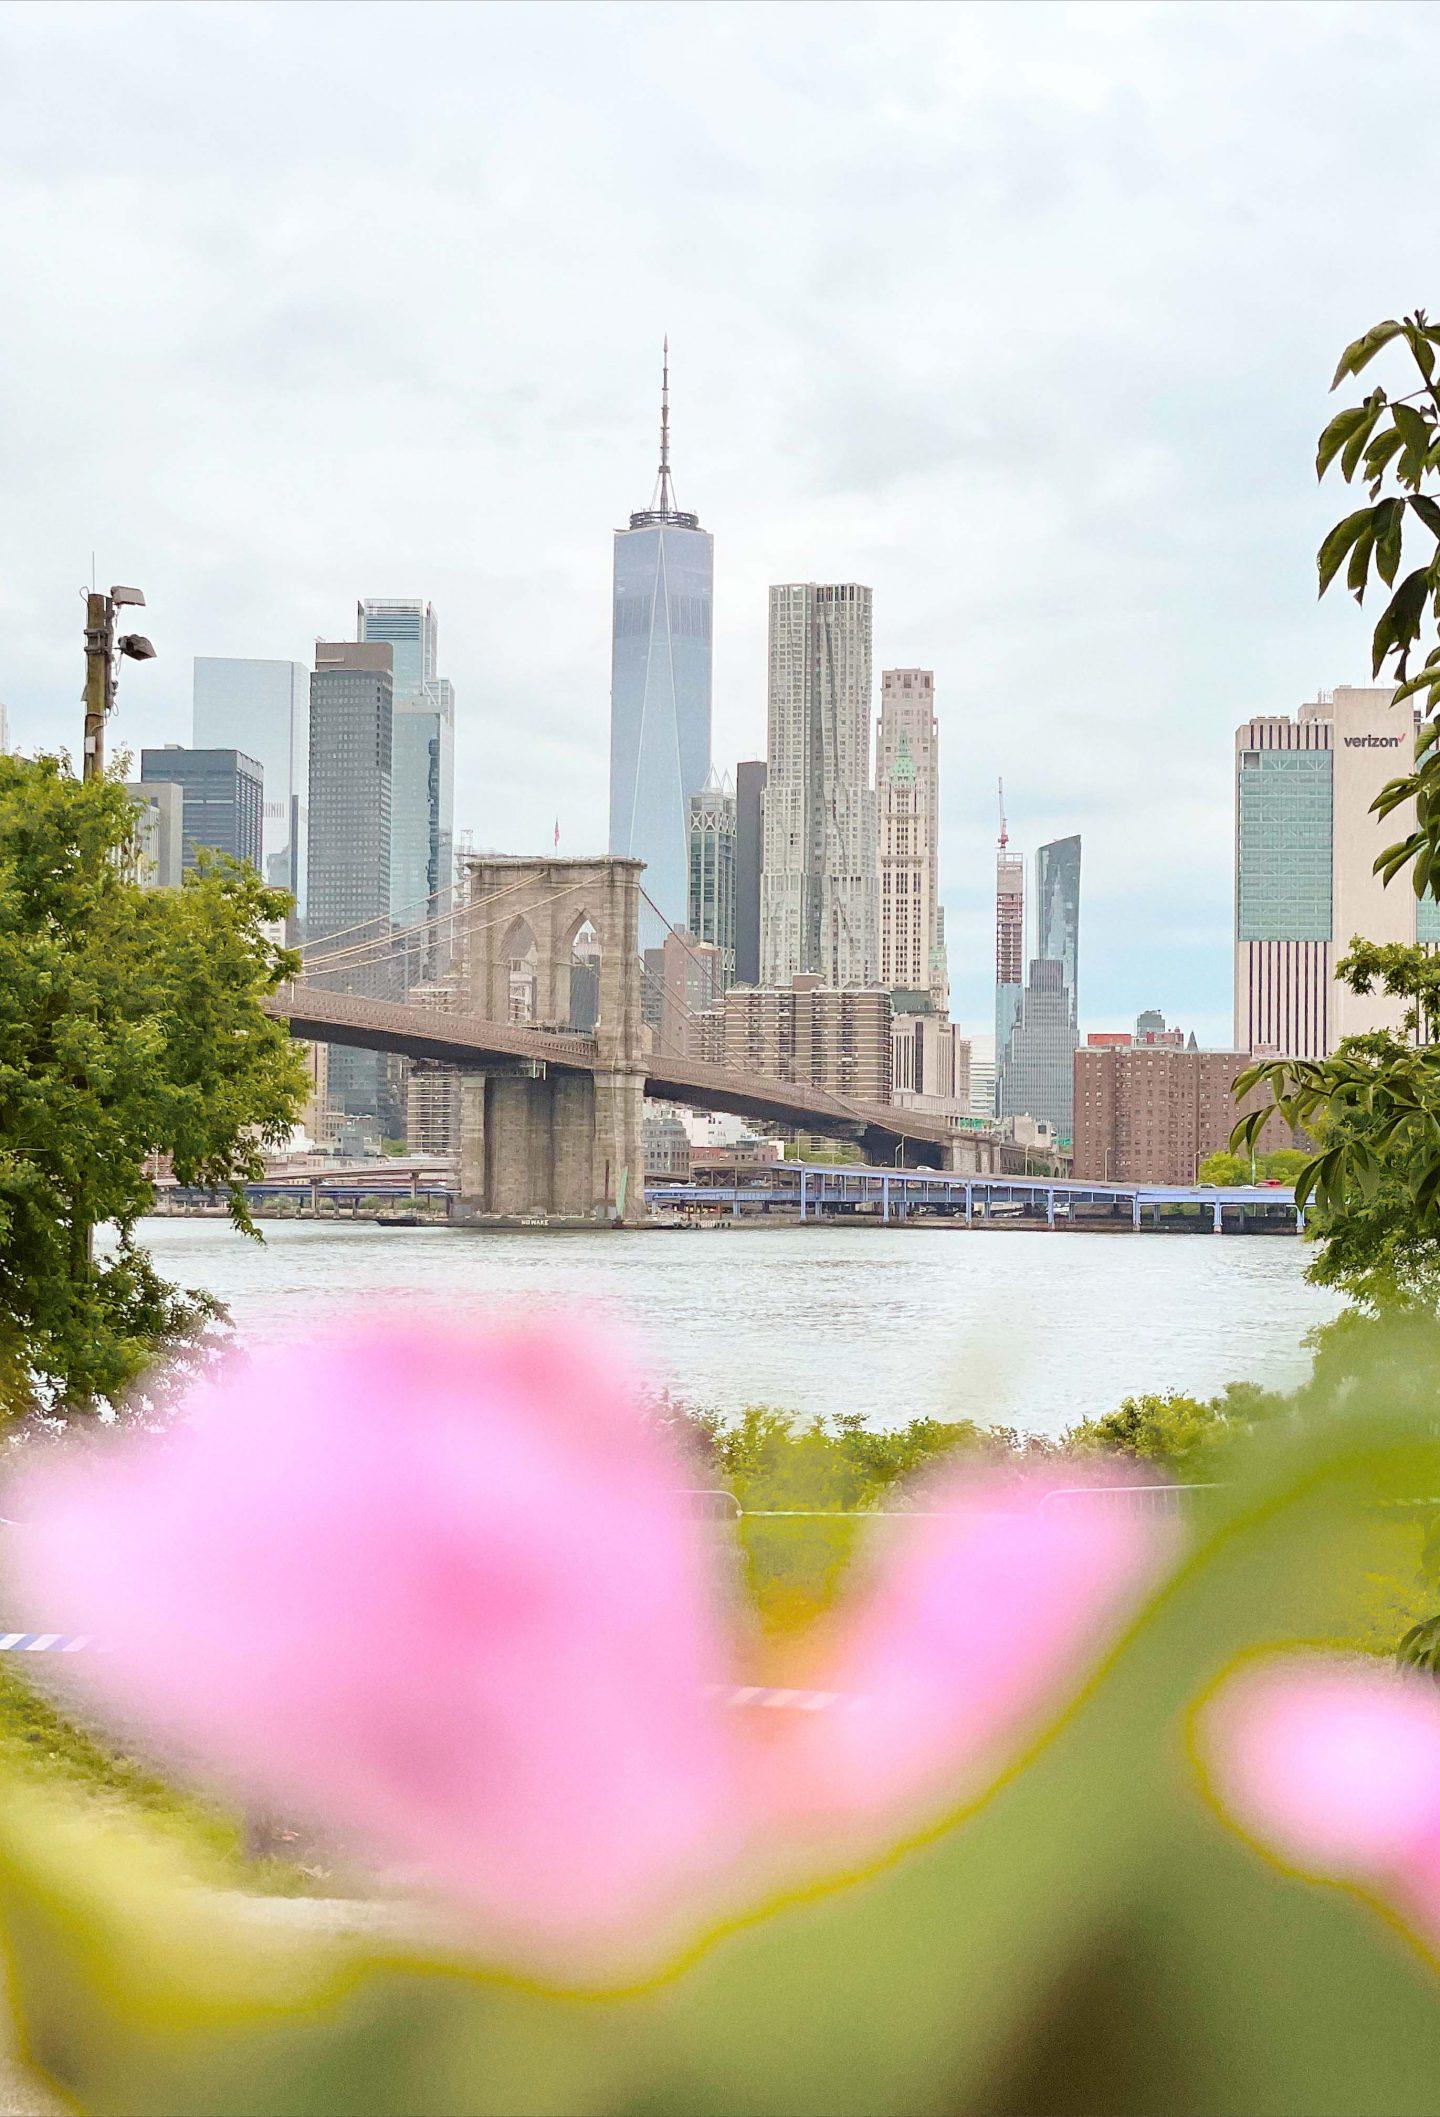 Dumbo Brooklyn | New York City in 2021